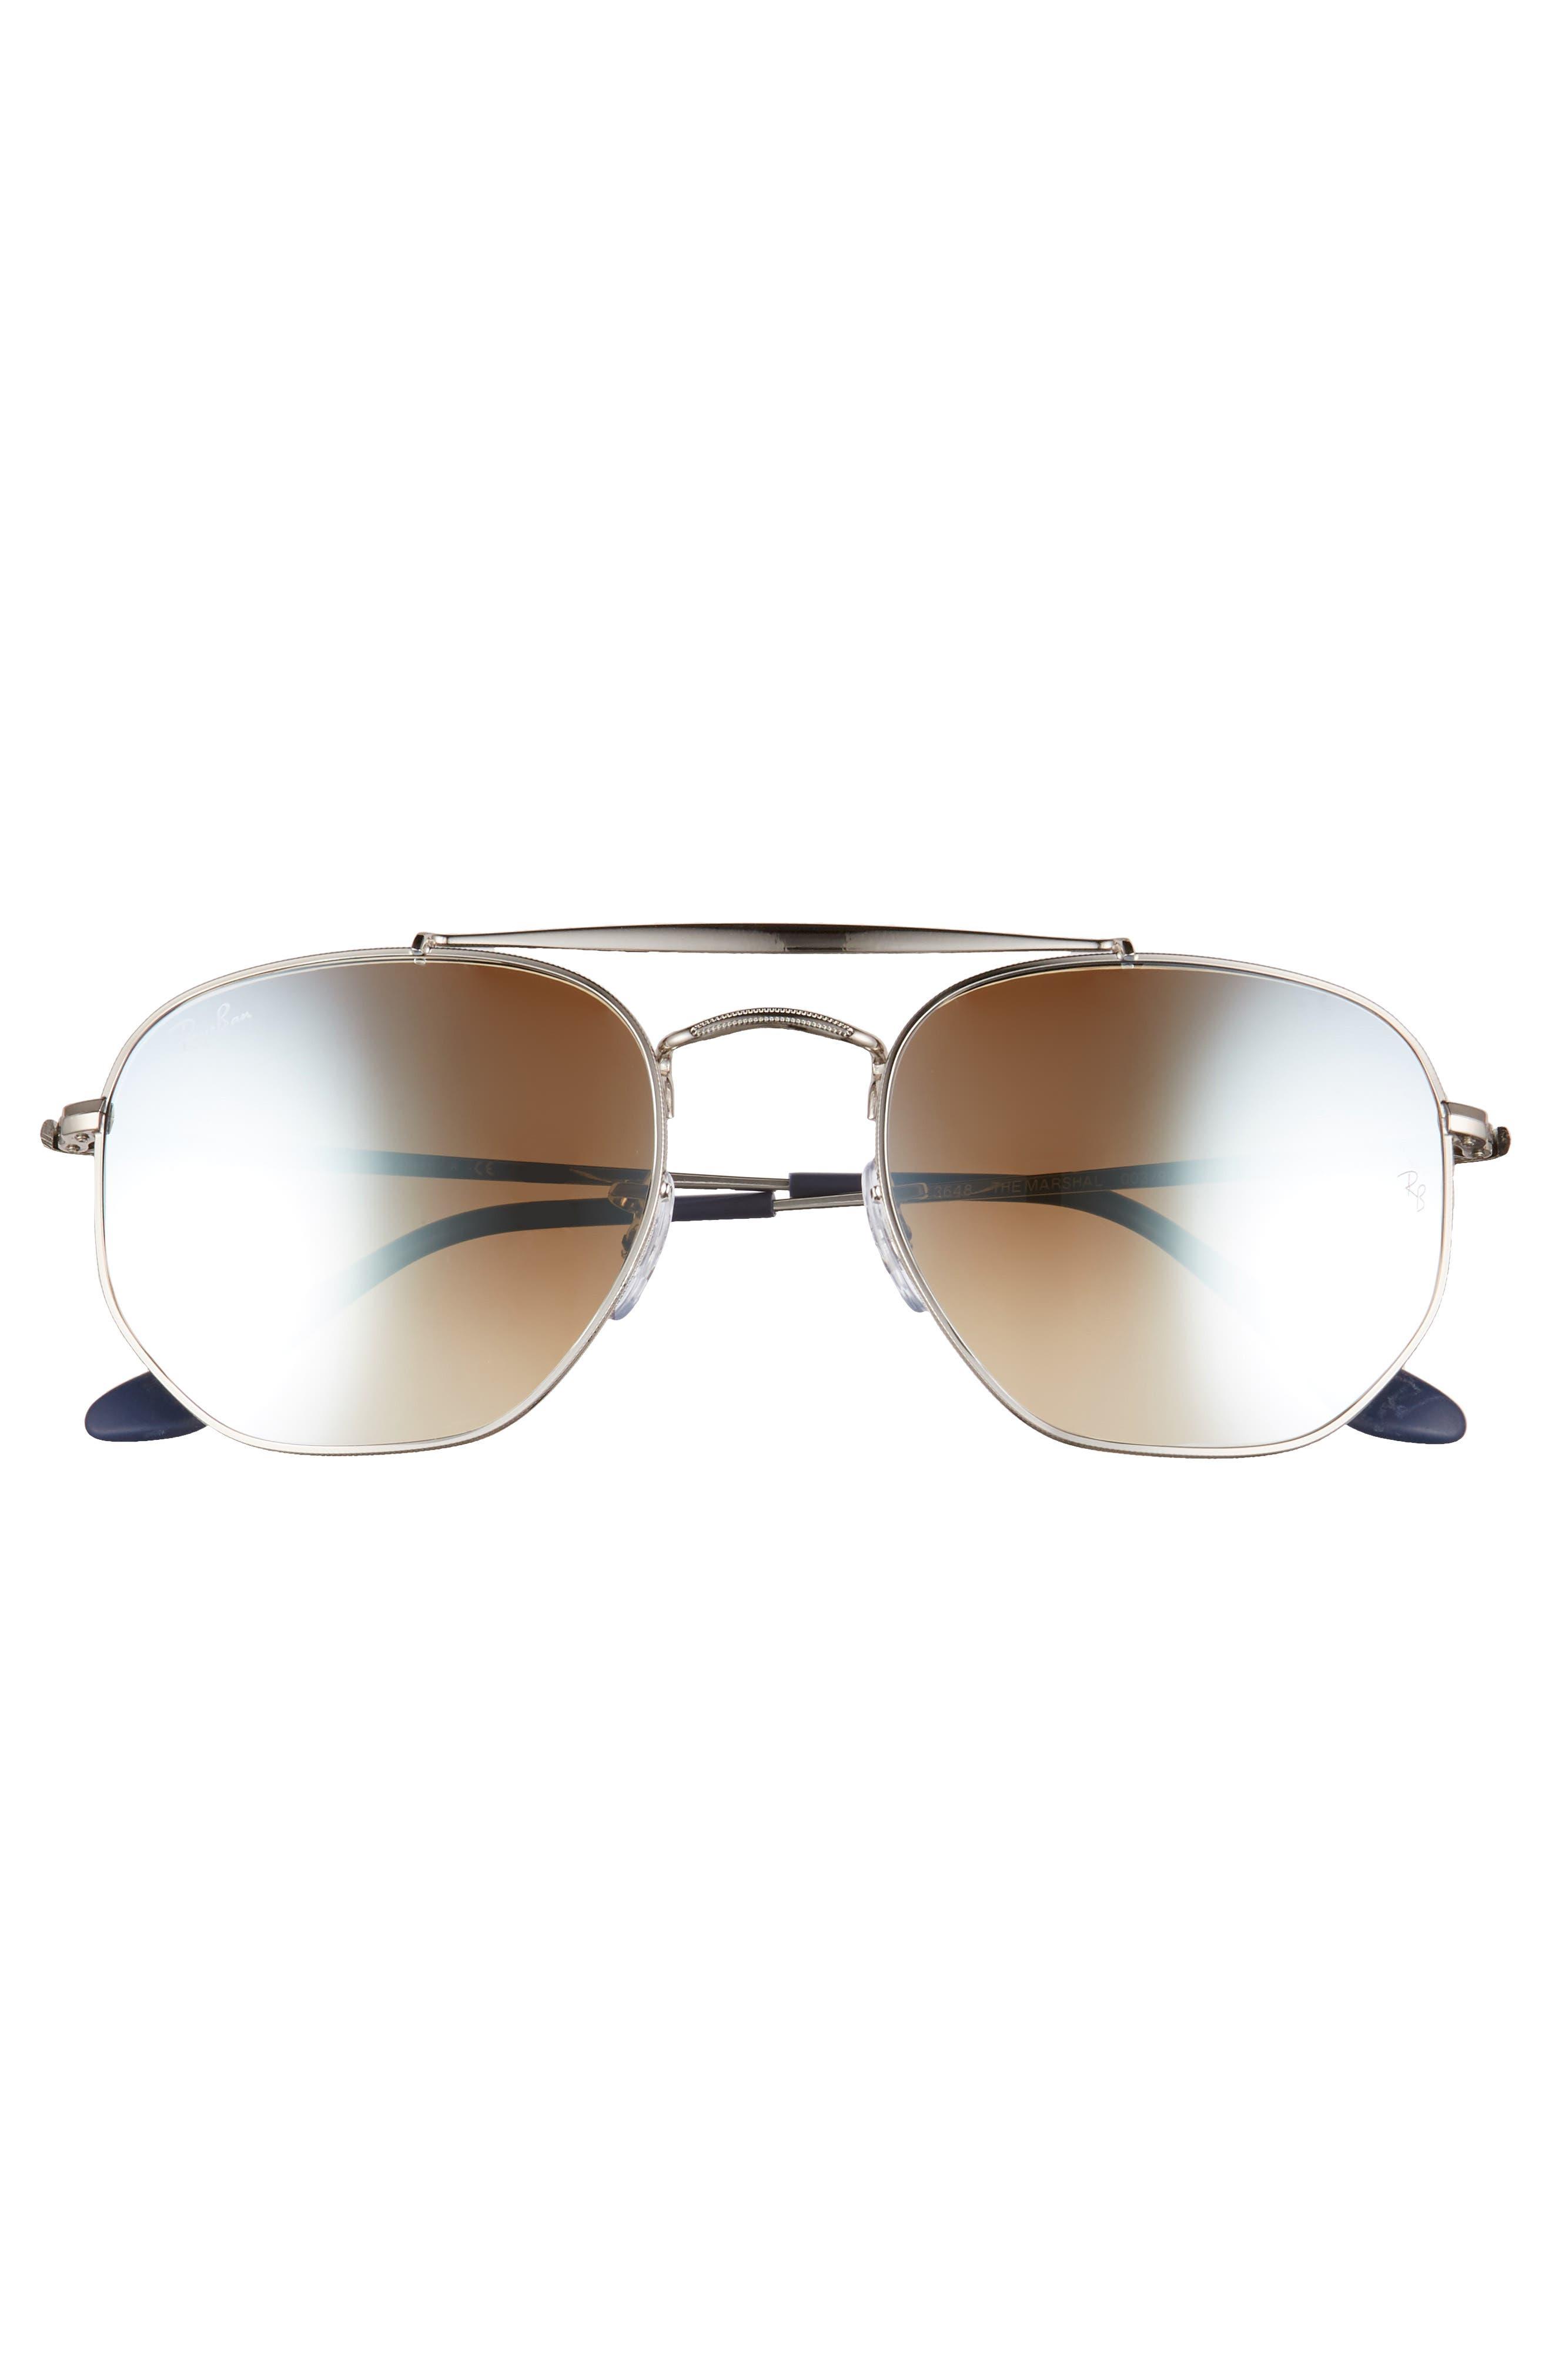 Marshal 54mm Aviator Sunglasses,                             Alternate thumbnail 2, color,                             SILVER